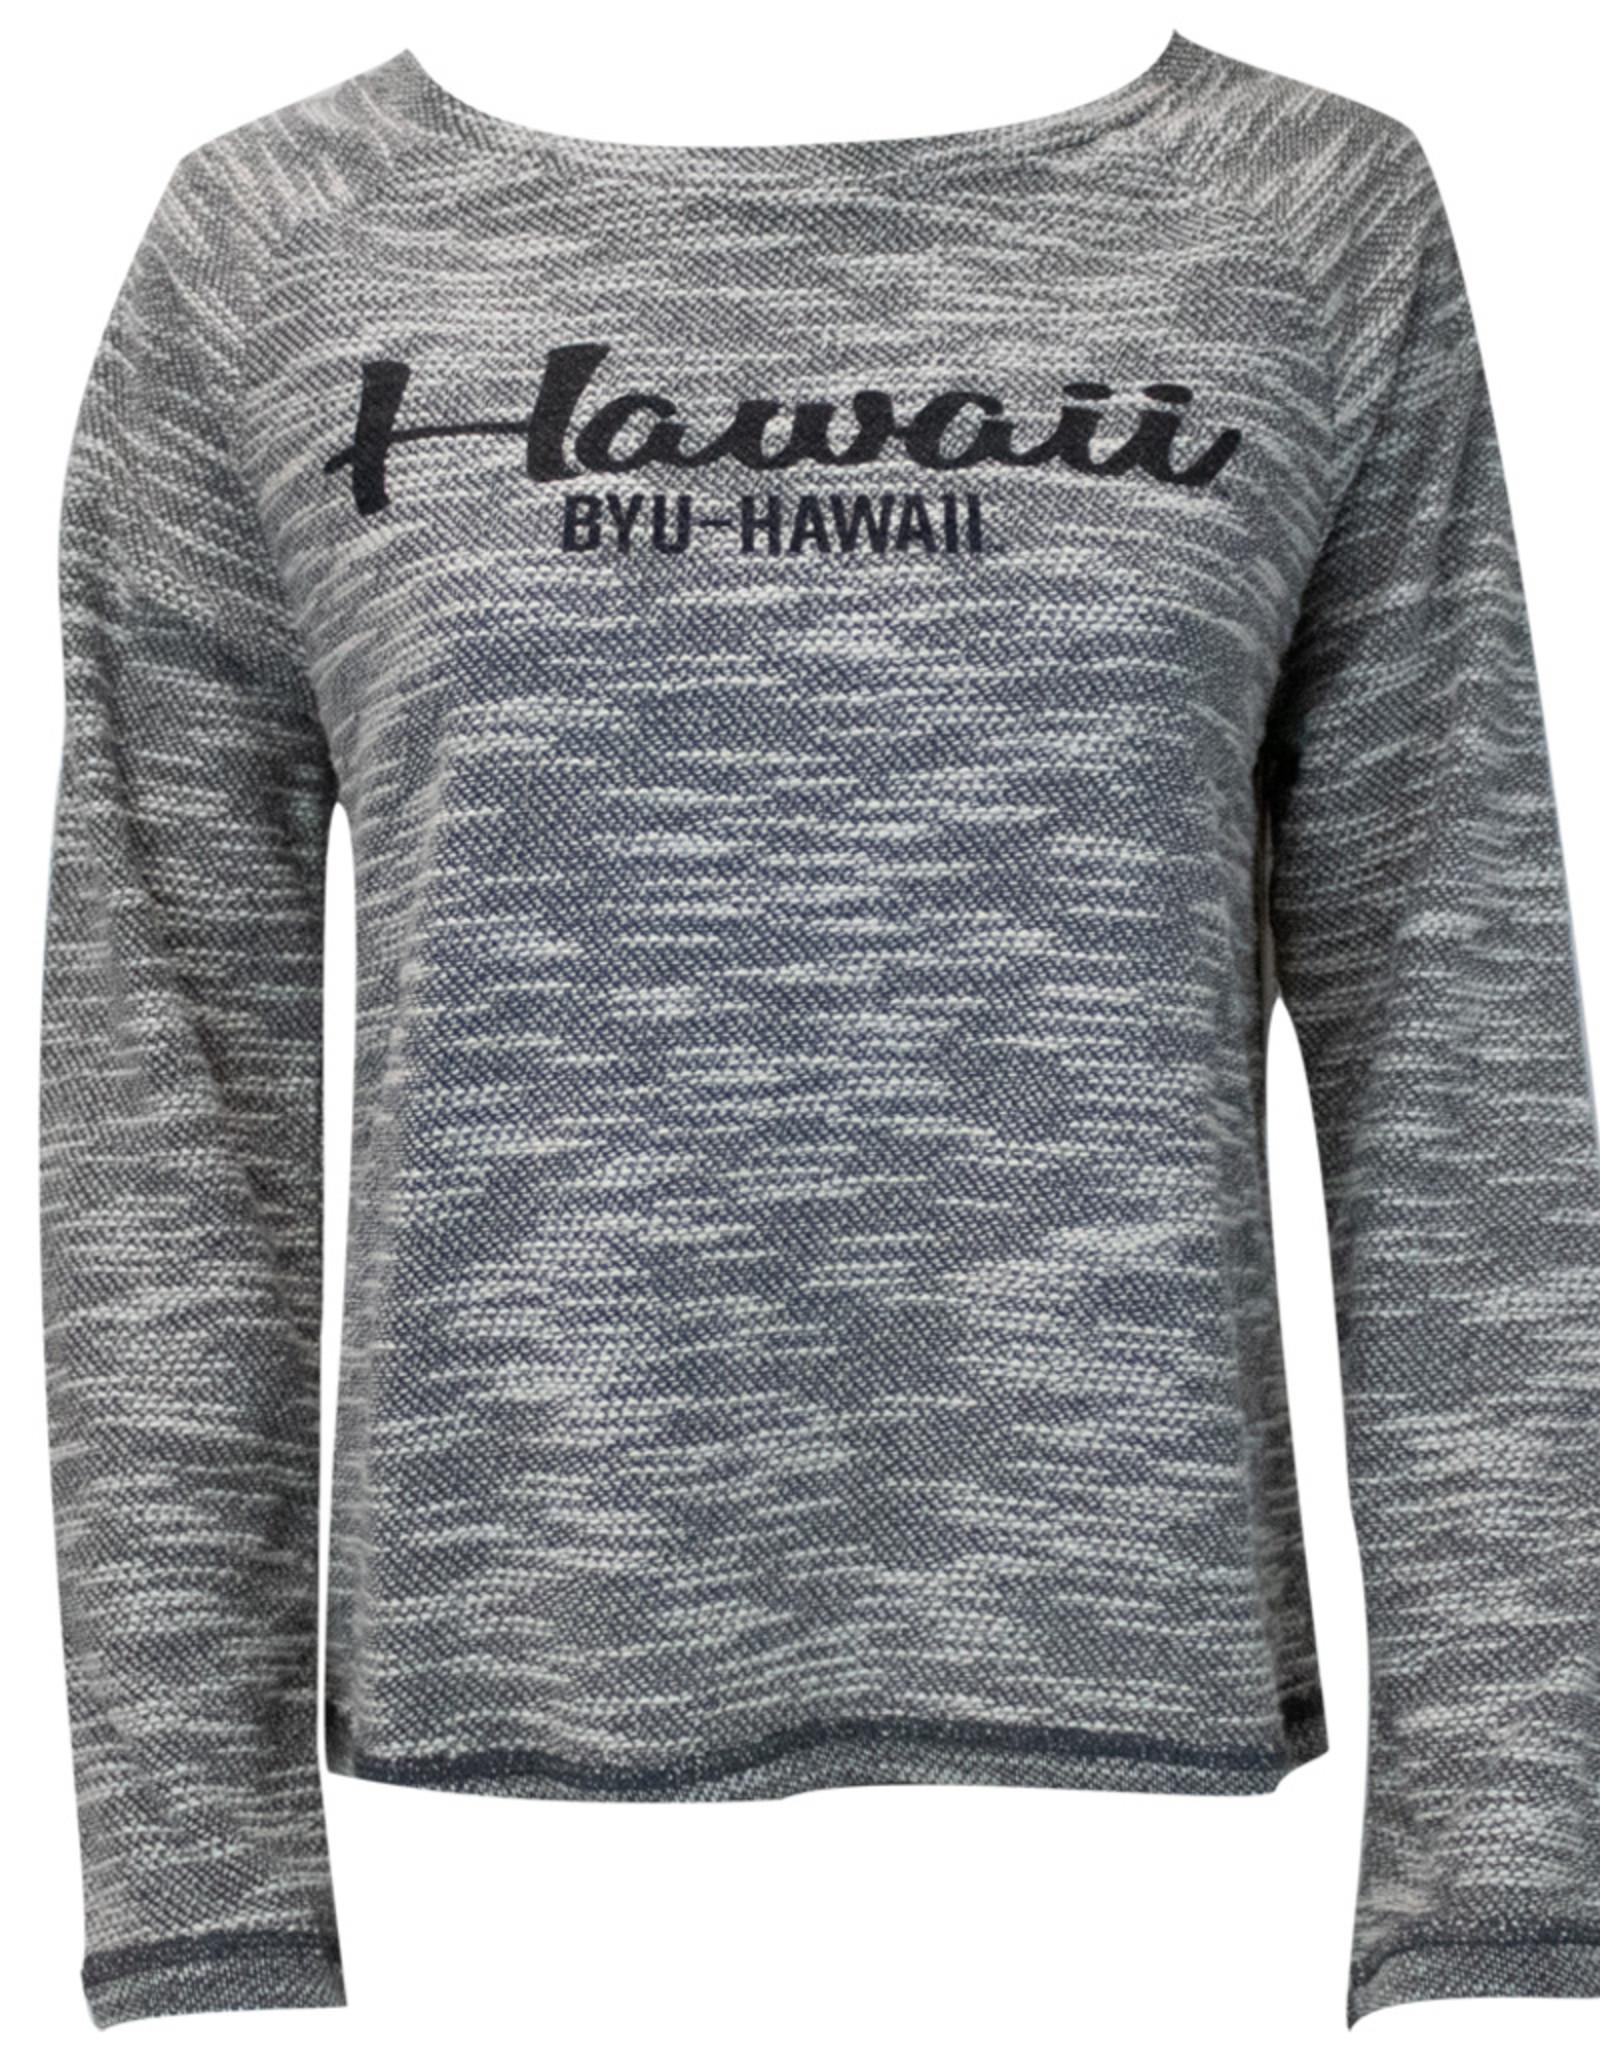 Clearance - BYU-Hawaii Waverly Crew Neck Long Sleeve